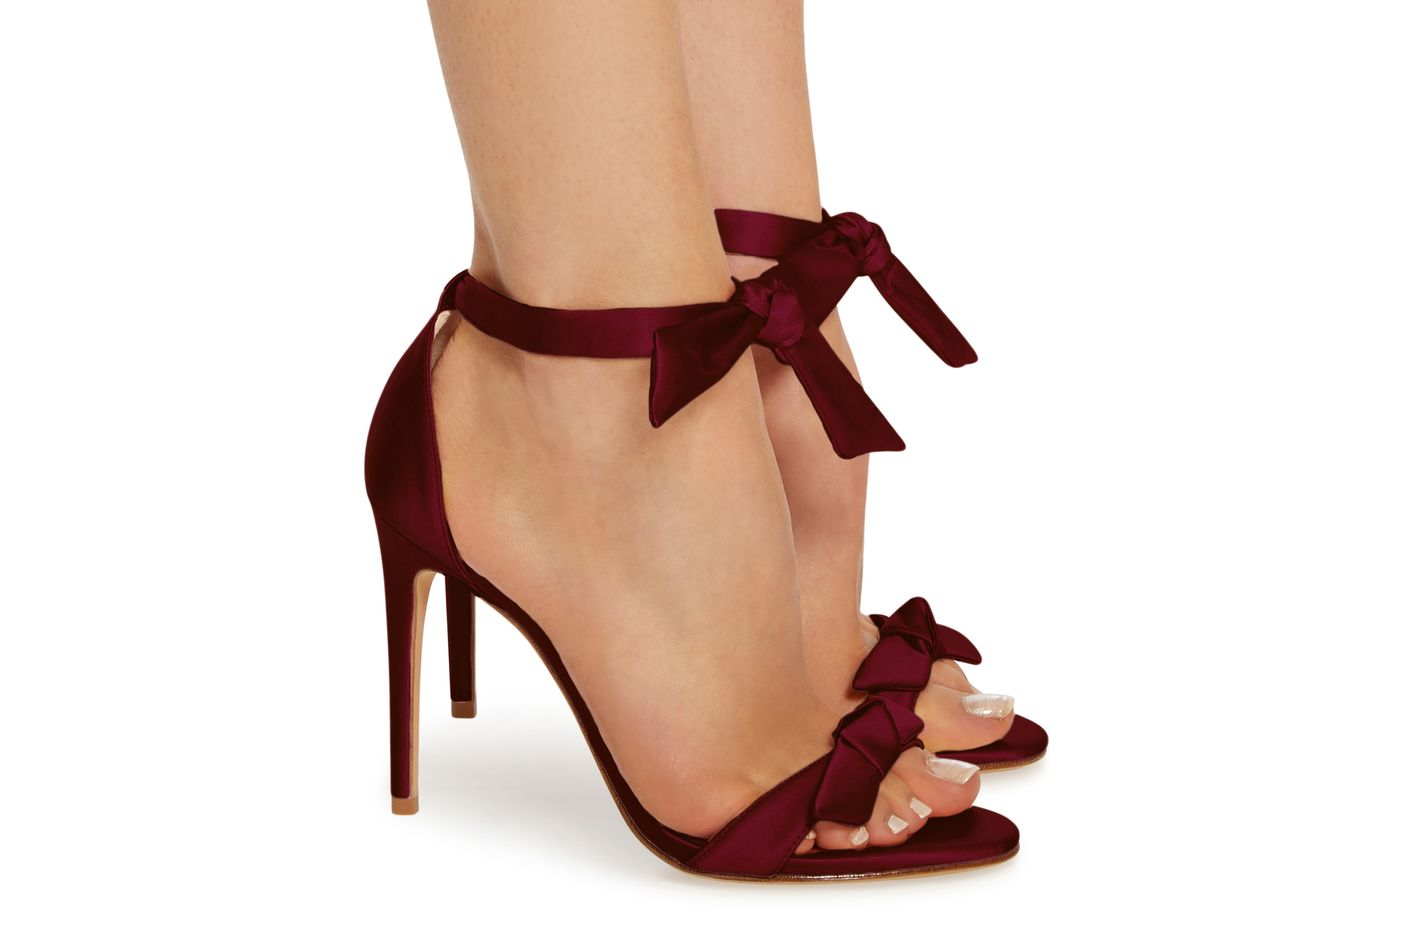 Alexandre Birman M'O Exclusive Clarita Satin Sandals